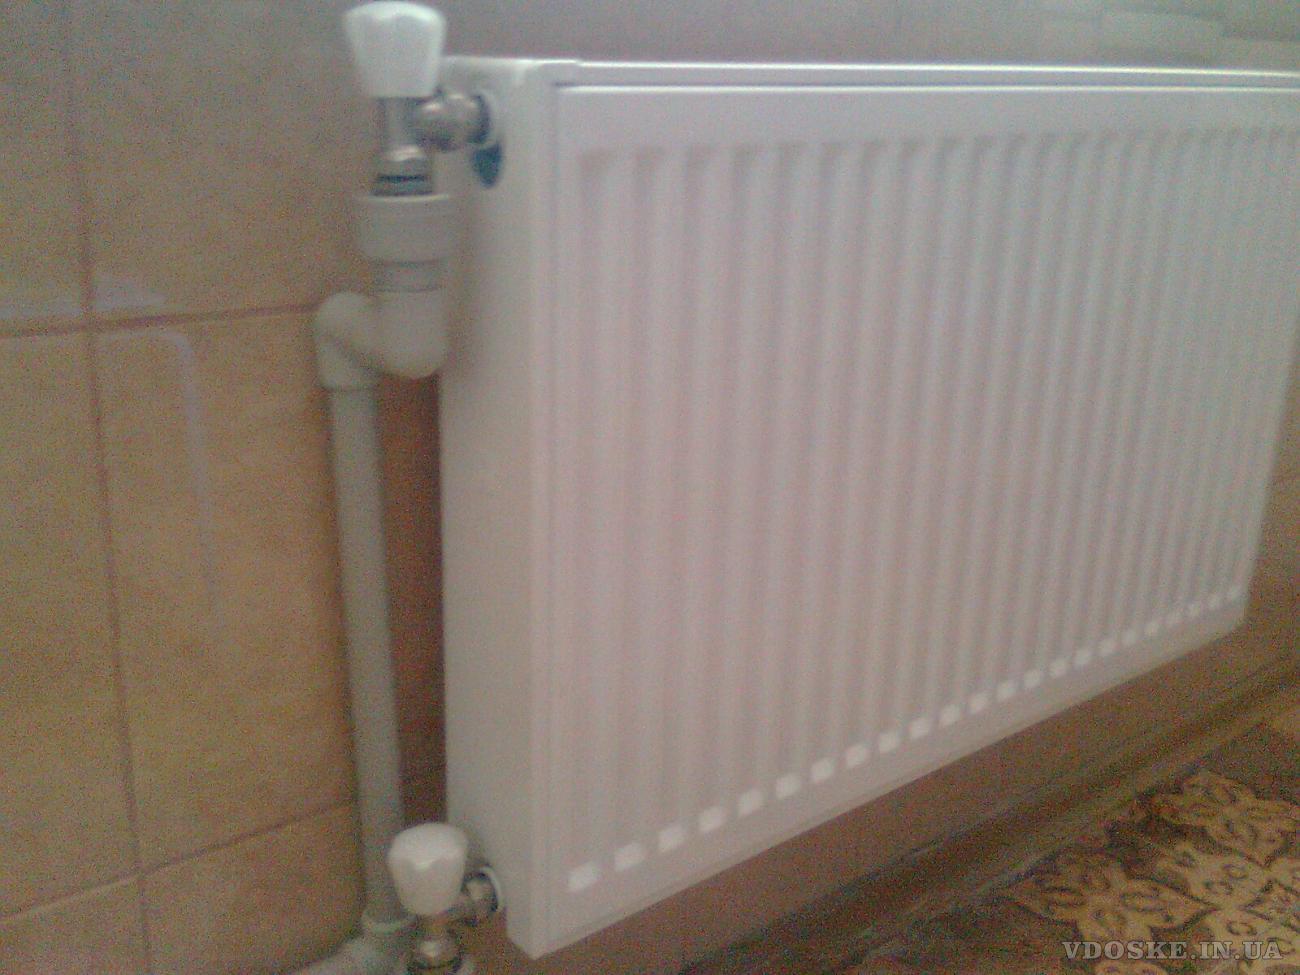 #Монтаж систем отопления.Отопление под Ключ.Замена отопления